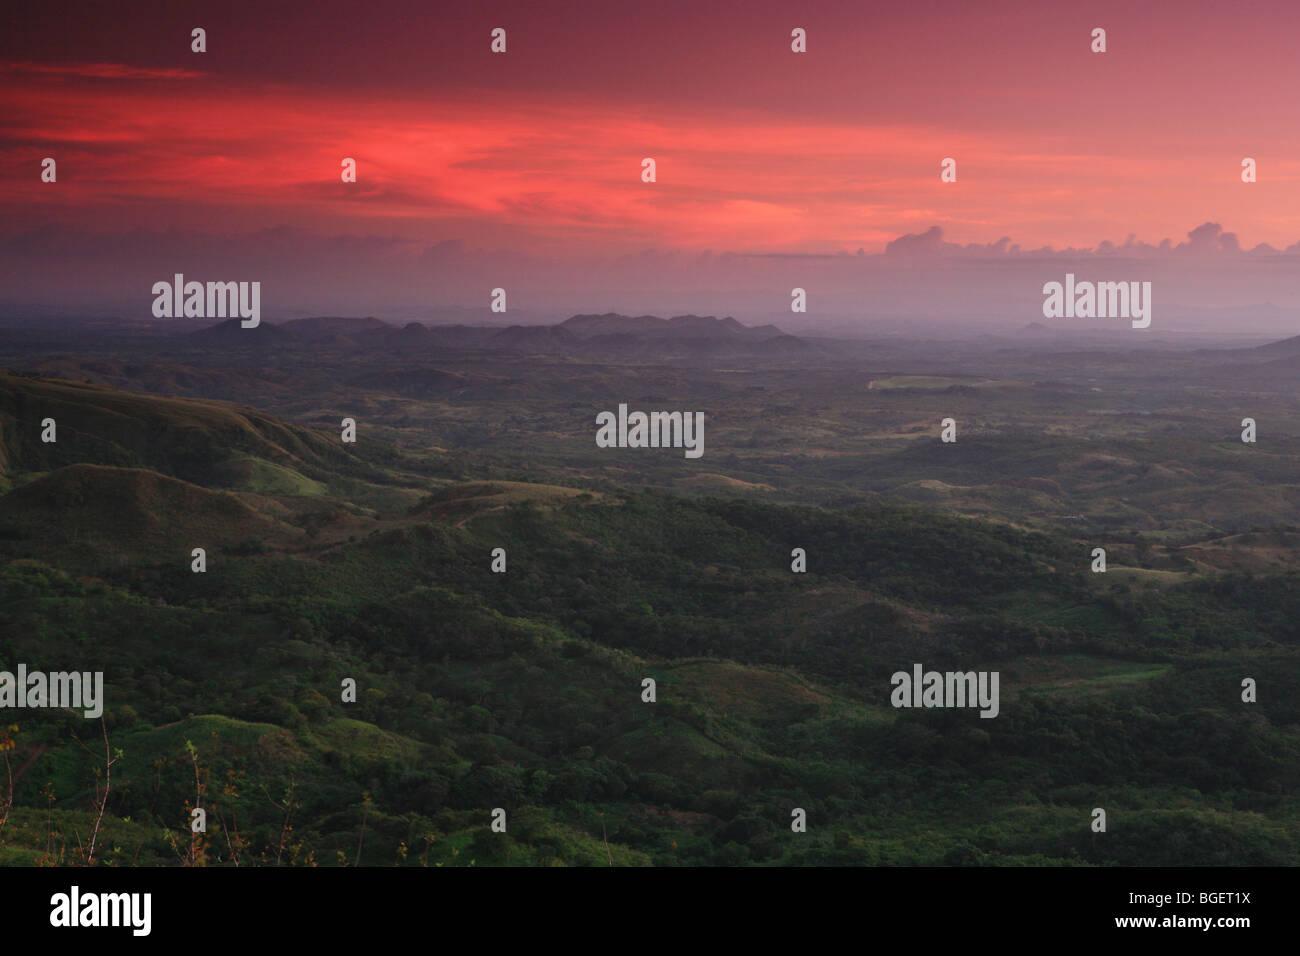 Beautiful sunset near Ola, Cordillera Central, Cocle province, Republic of Panama. - Stock Image